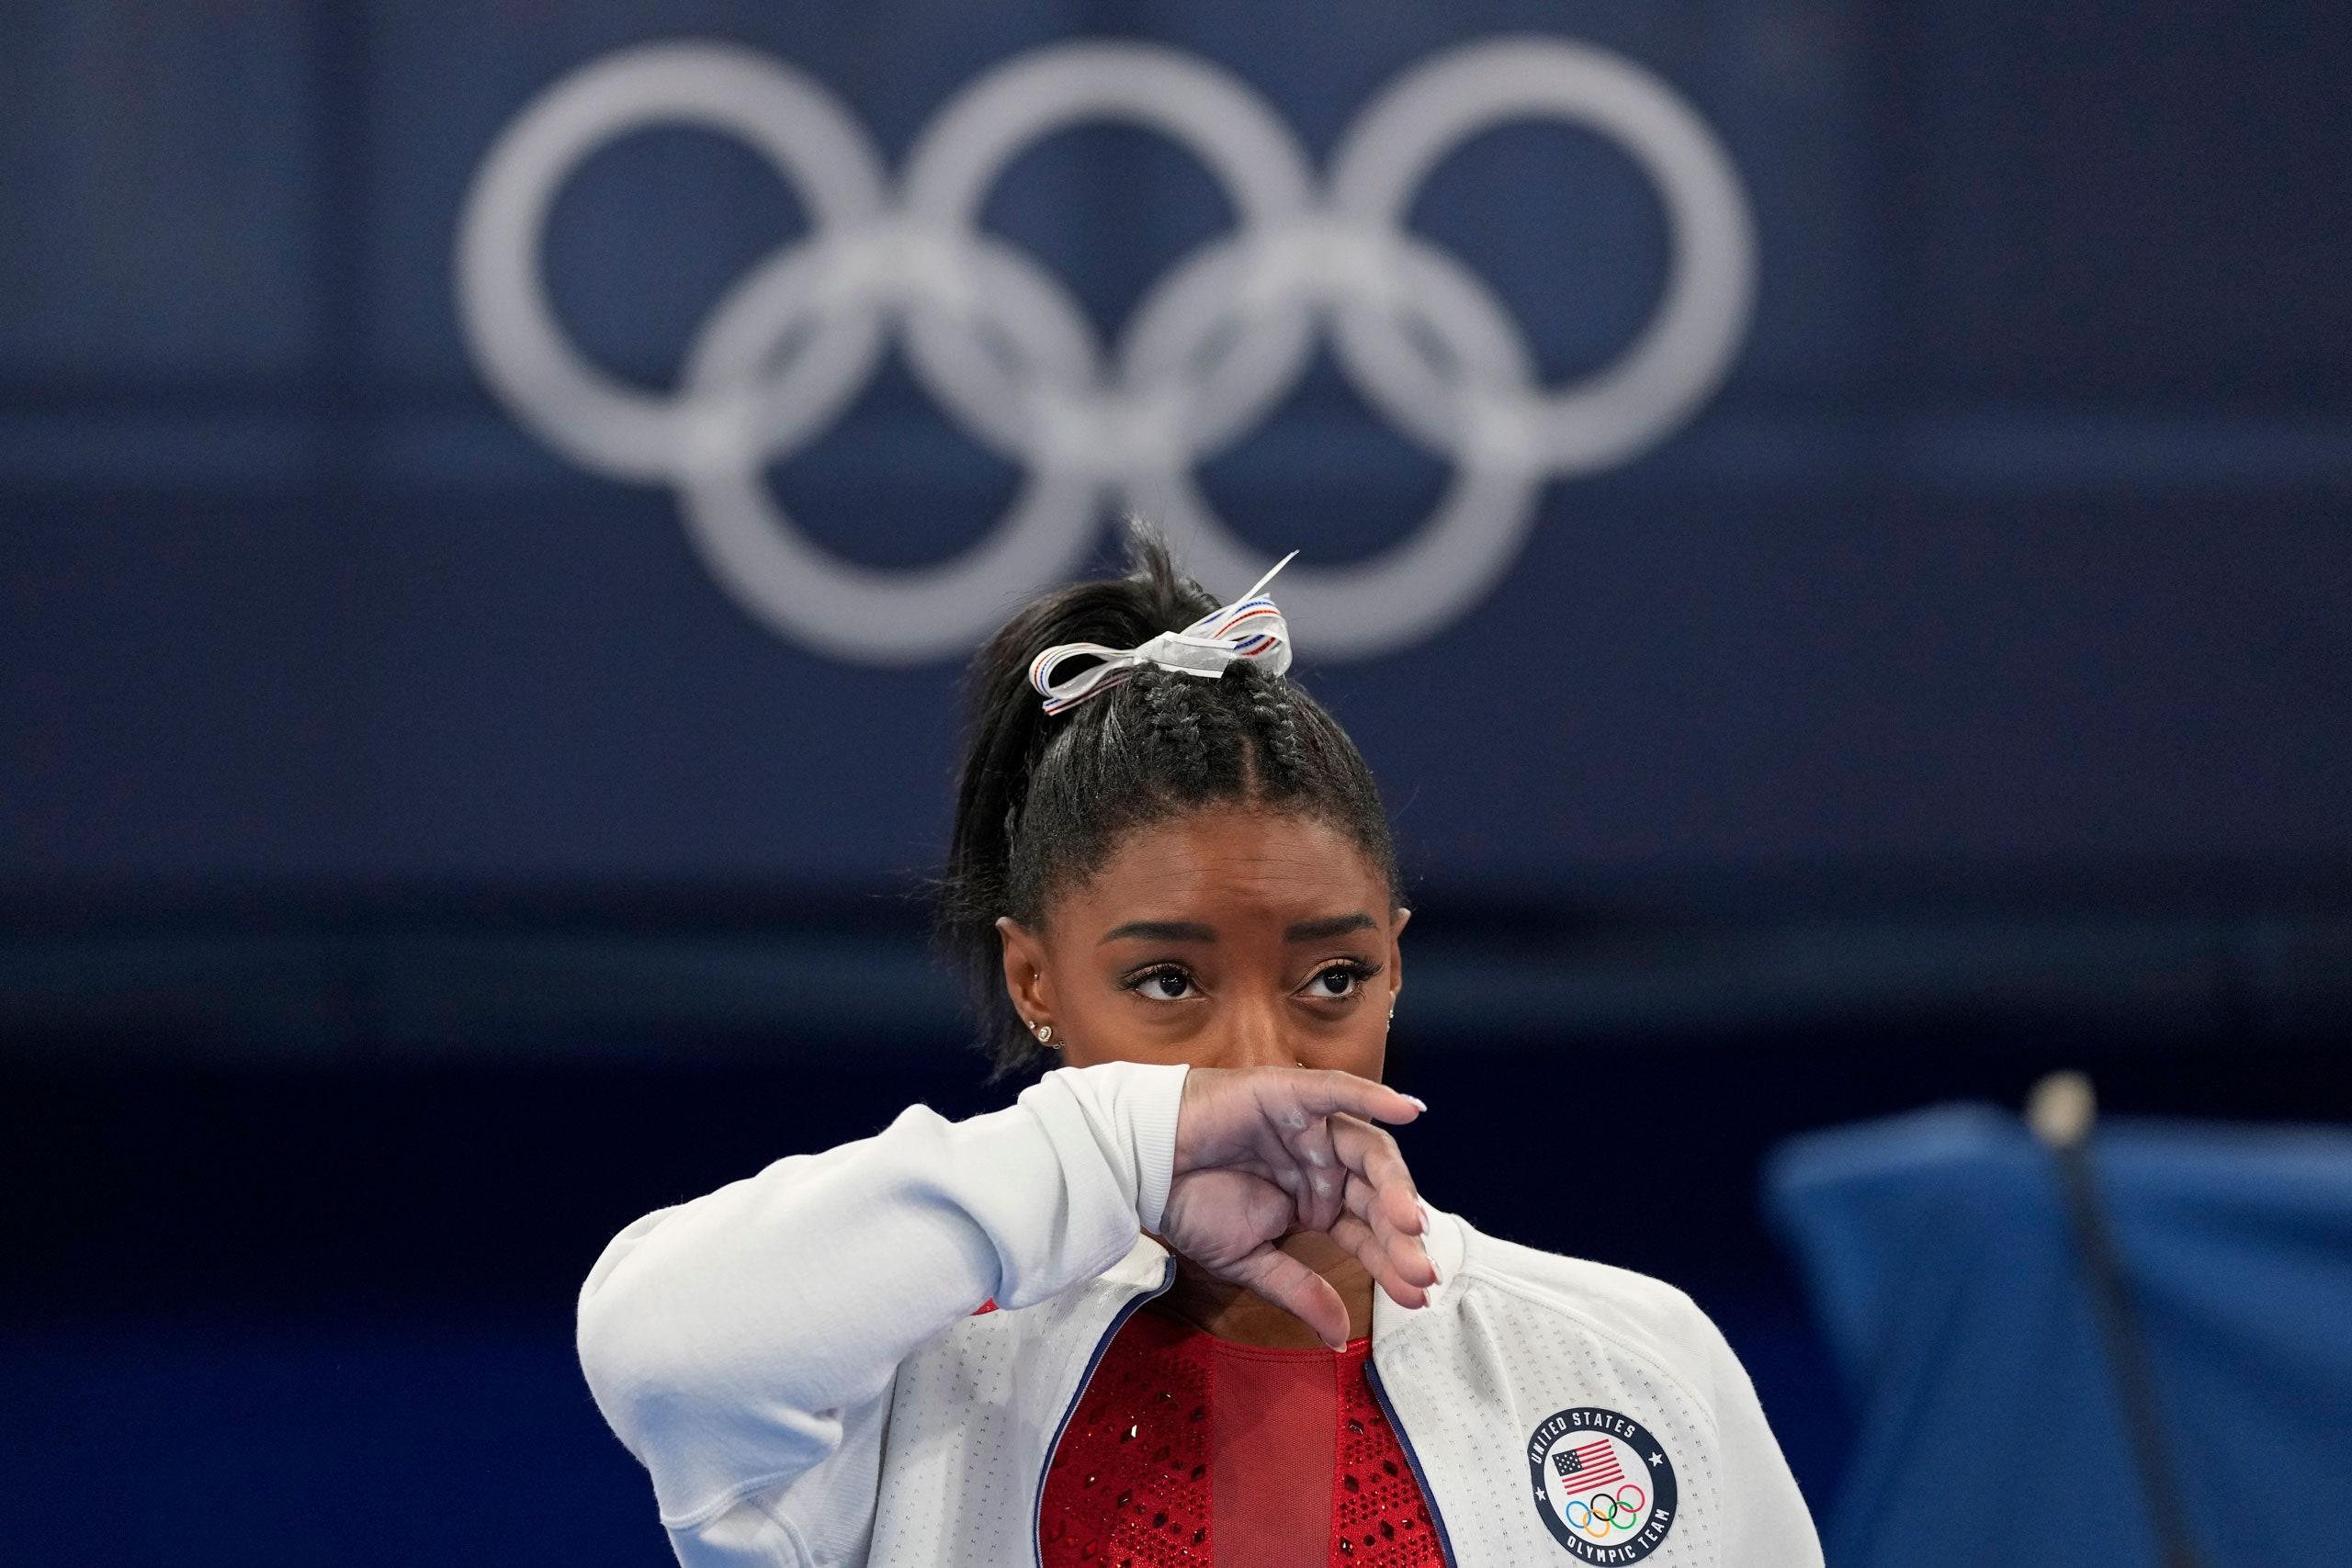 ژیمناستیک در المپیک